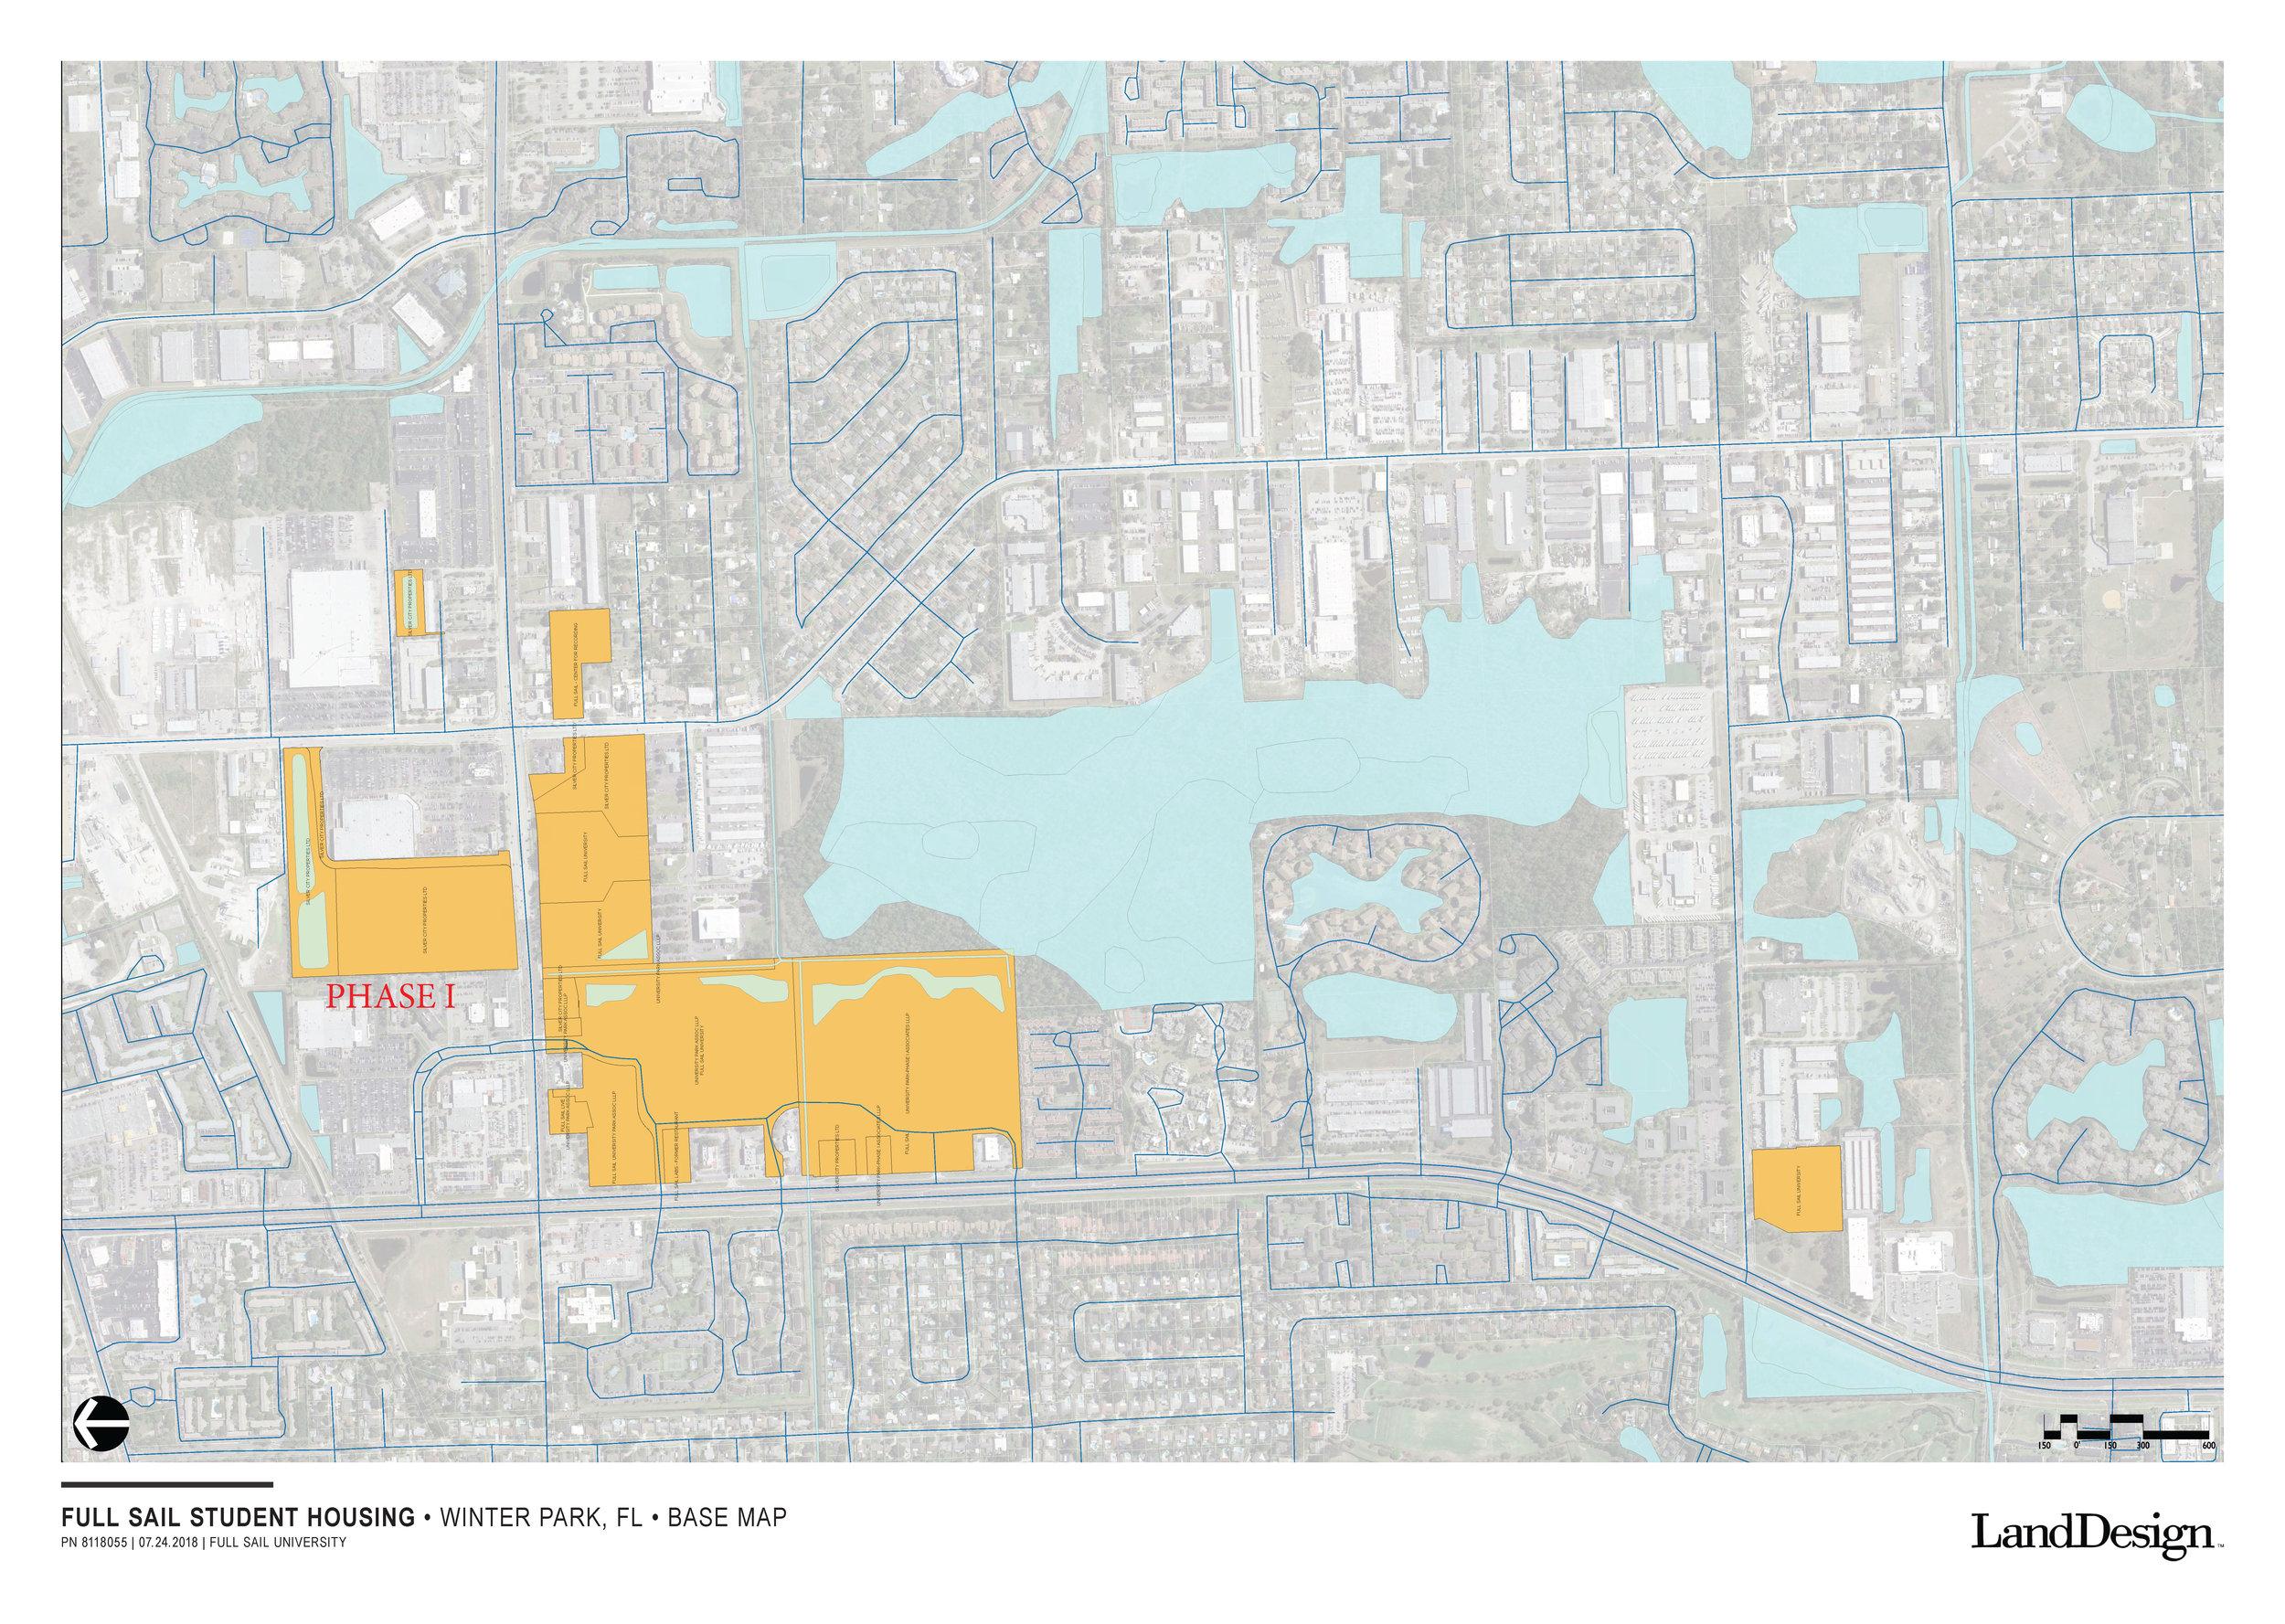 2018.07.24 Base Map Exhibit_EDITED.jpg